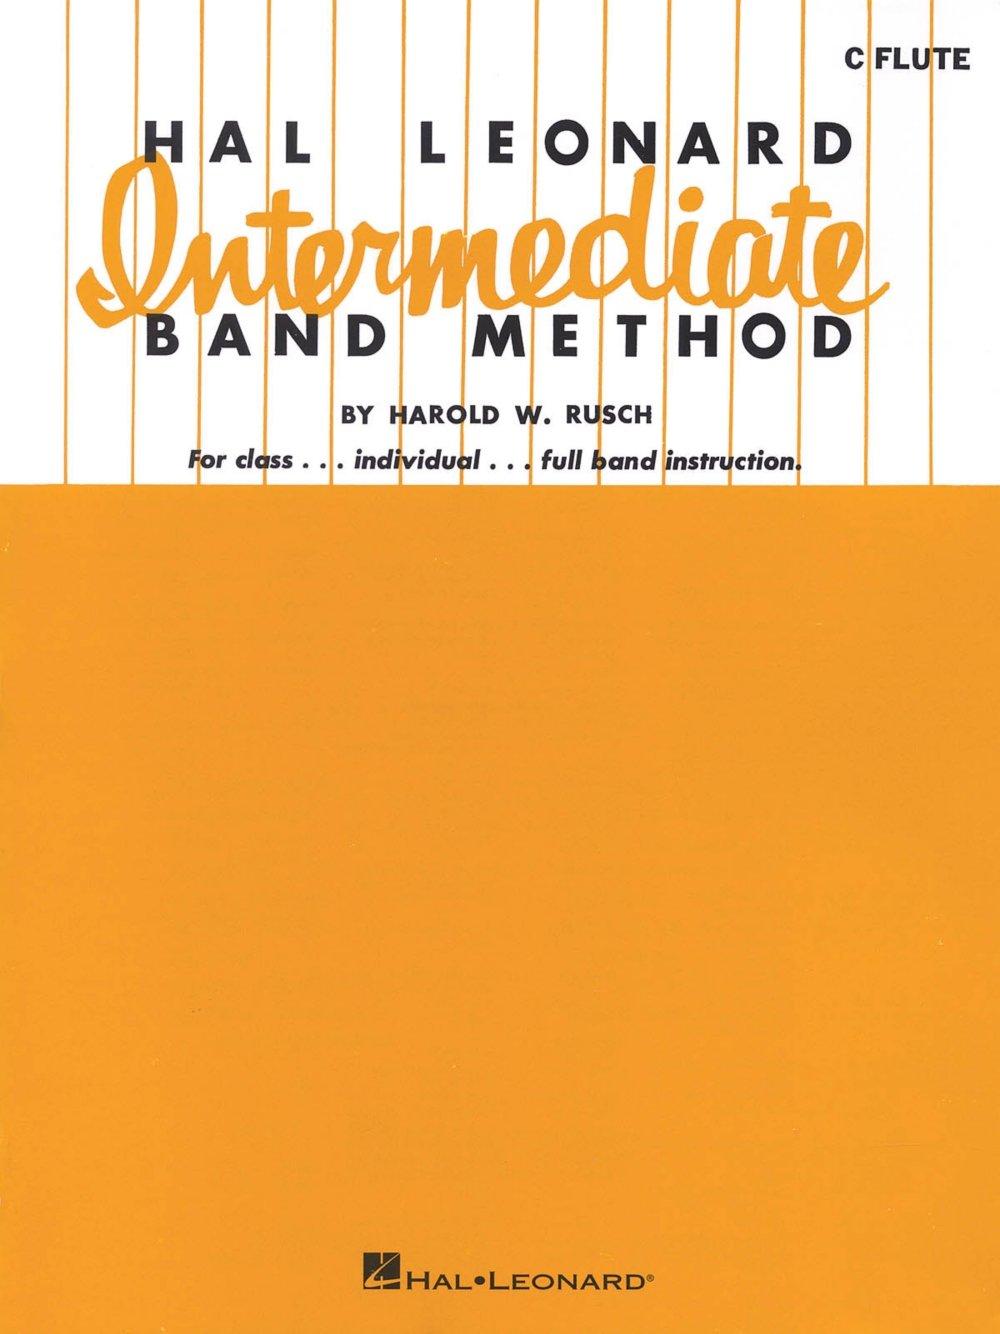 Hal Leonard Intermediate Band Method - Oboe Oboe HL